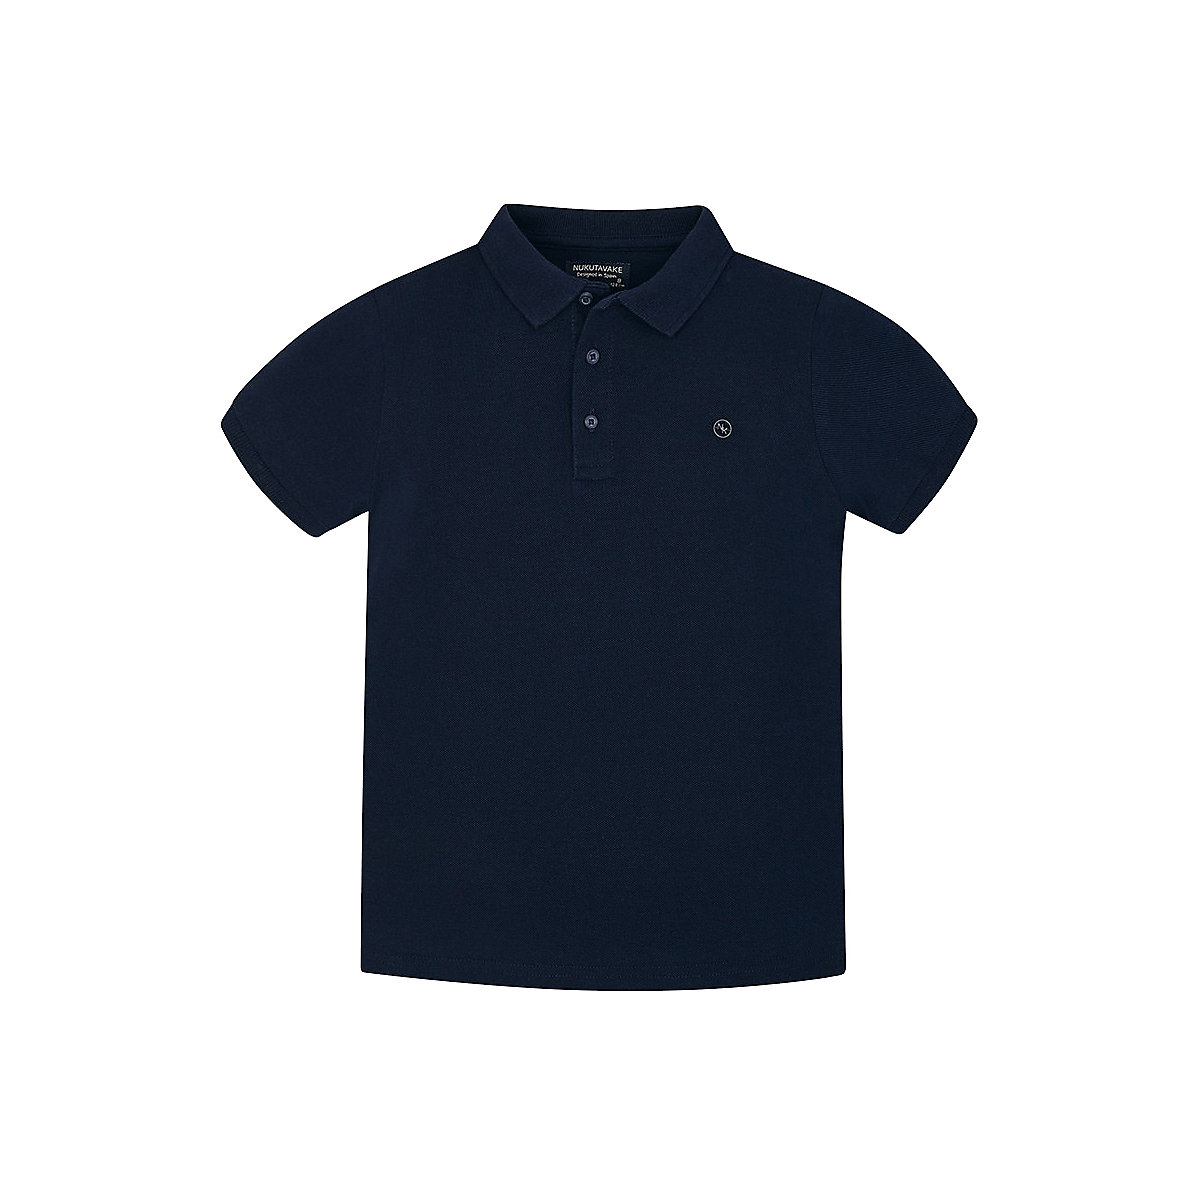 MAYORAL Polo Shirts 10681395 children clothing t-shirt shirt the print for boys